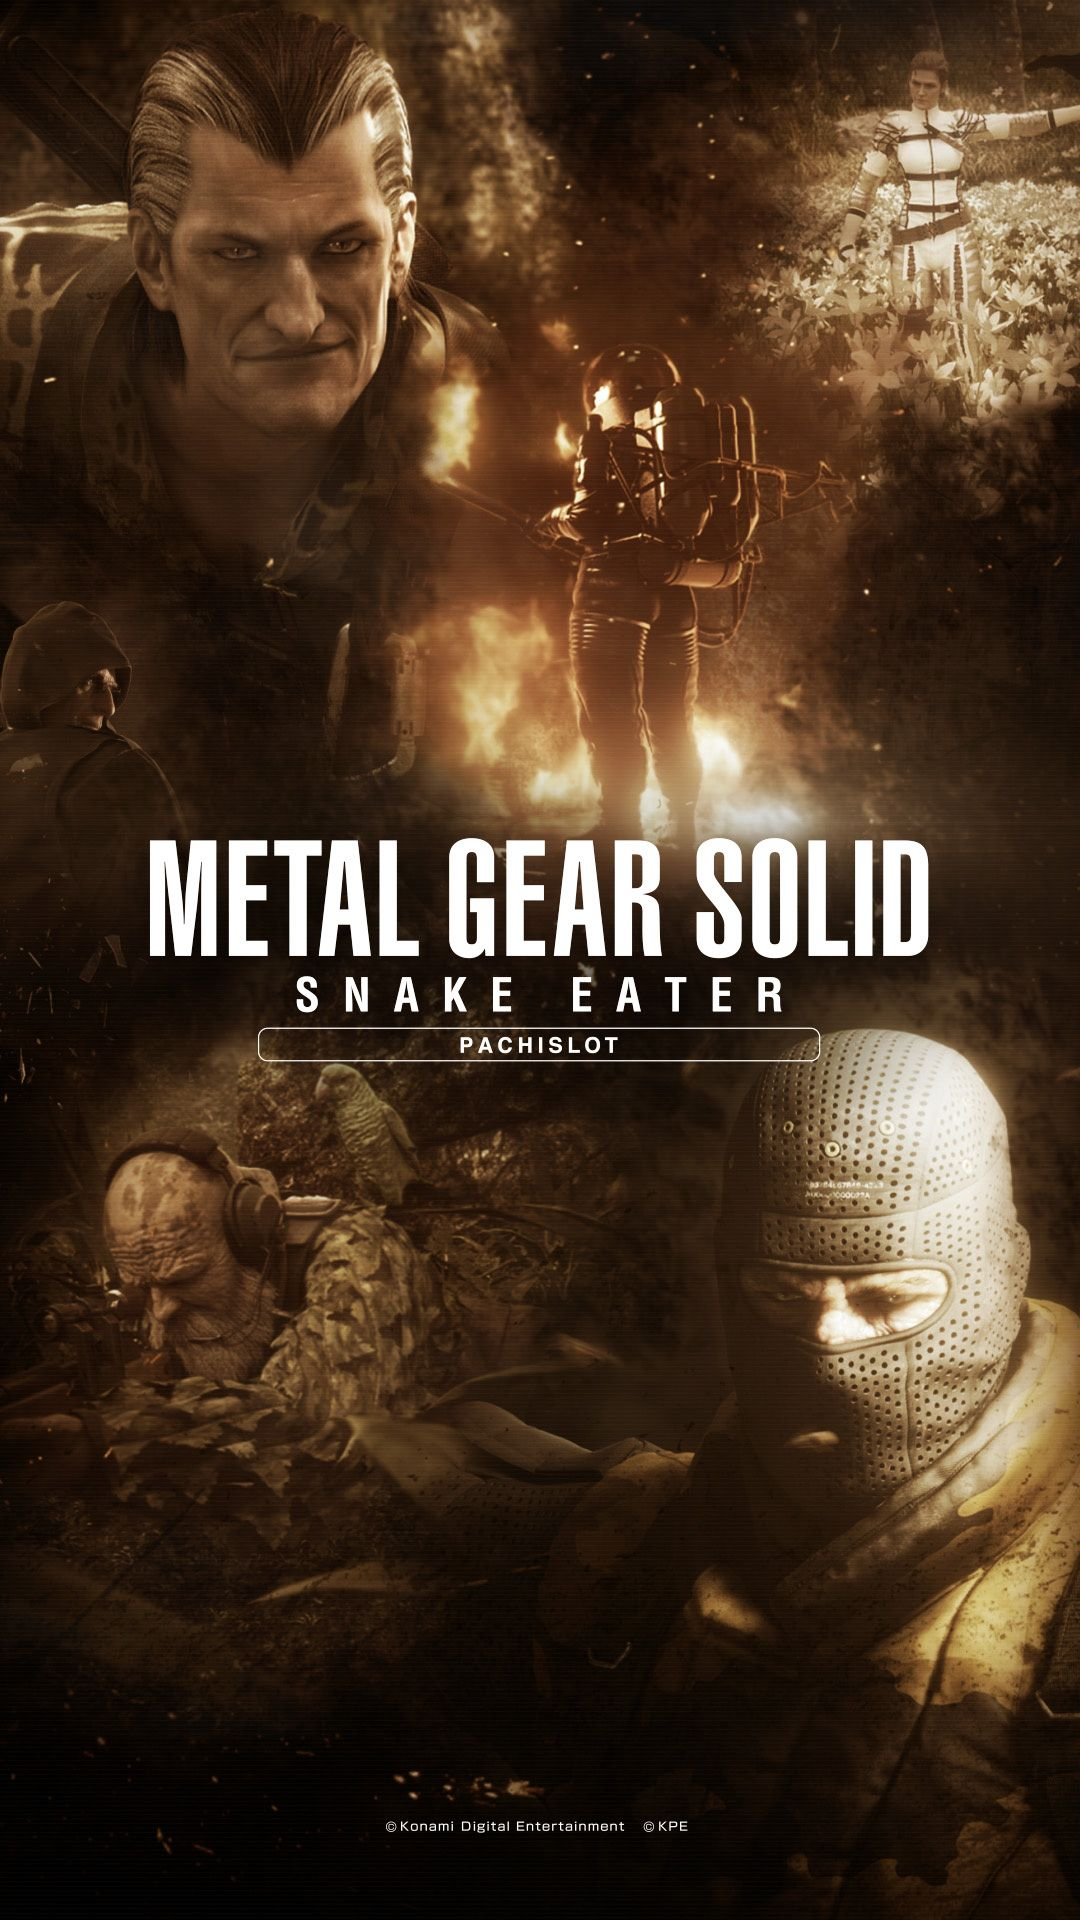 Mgs Snake Eater Pachislot Wallpaper Smartphone 13 Metal Gear Solid Metal Gear Metal Gear Series